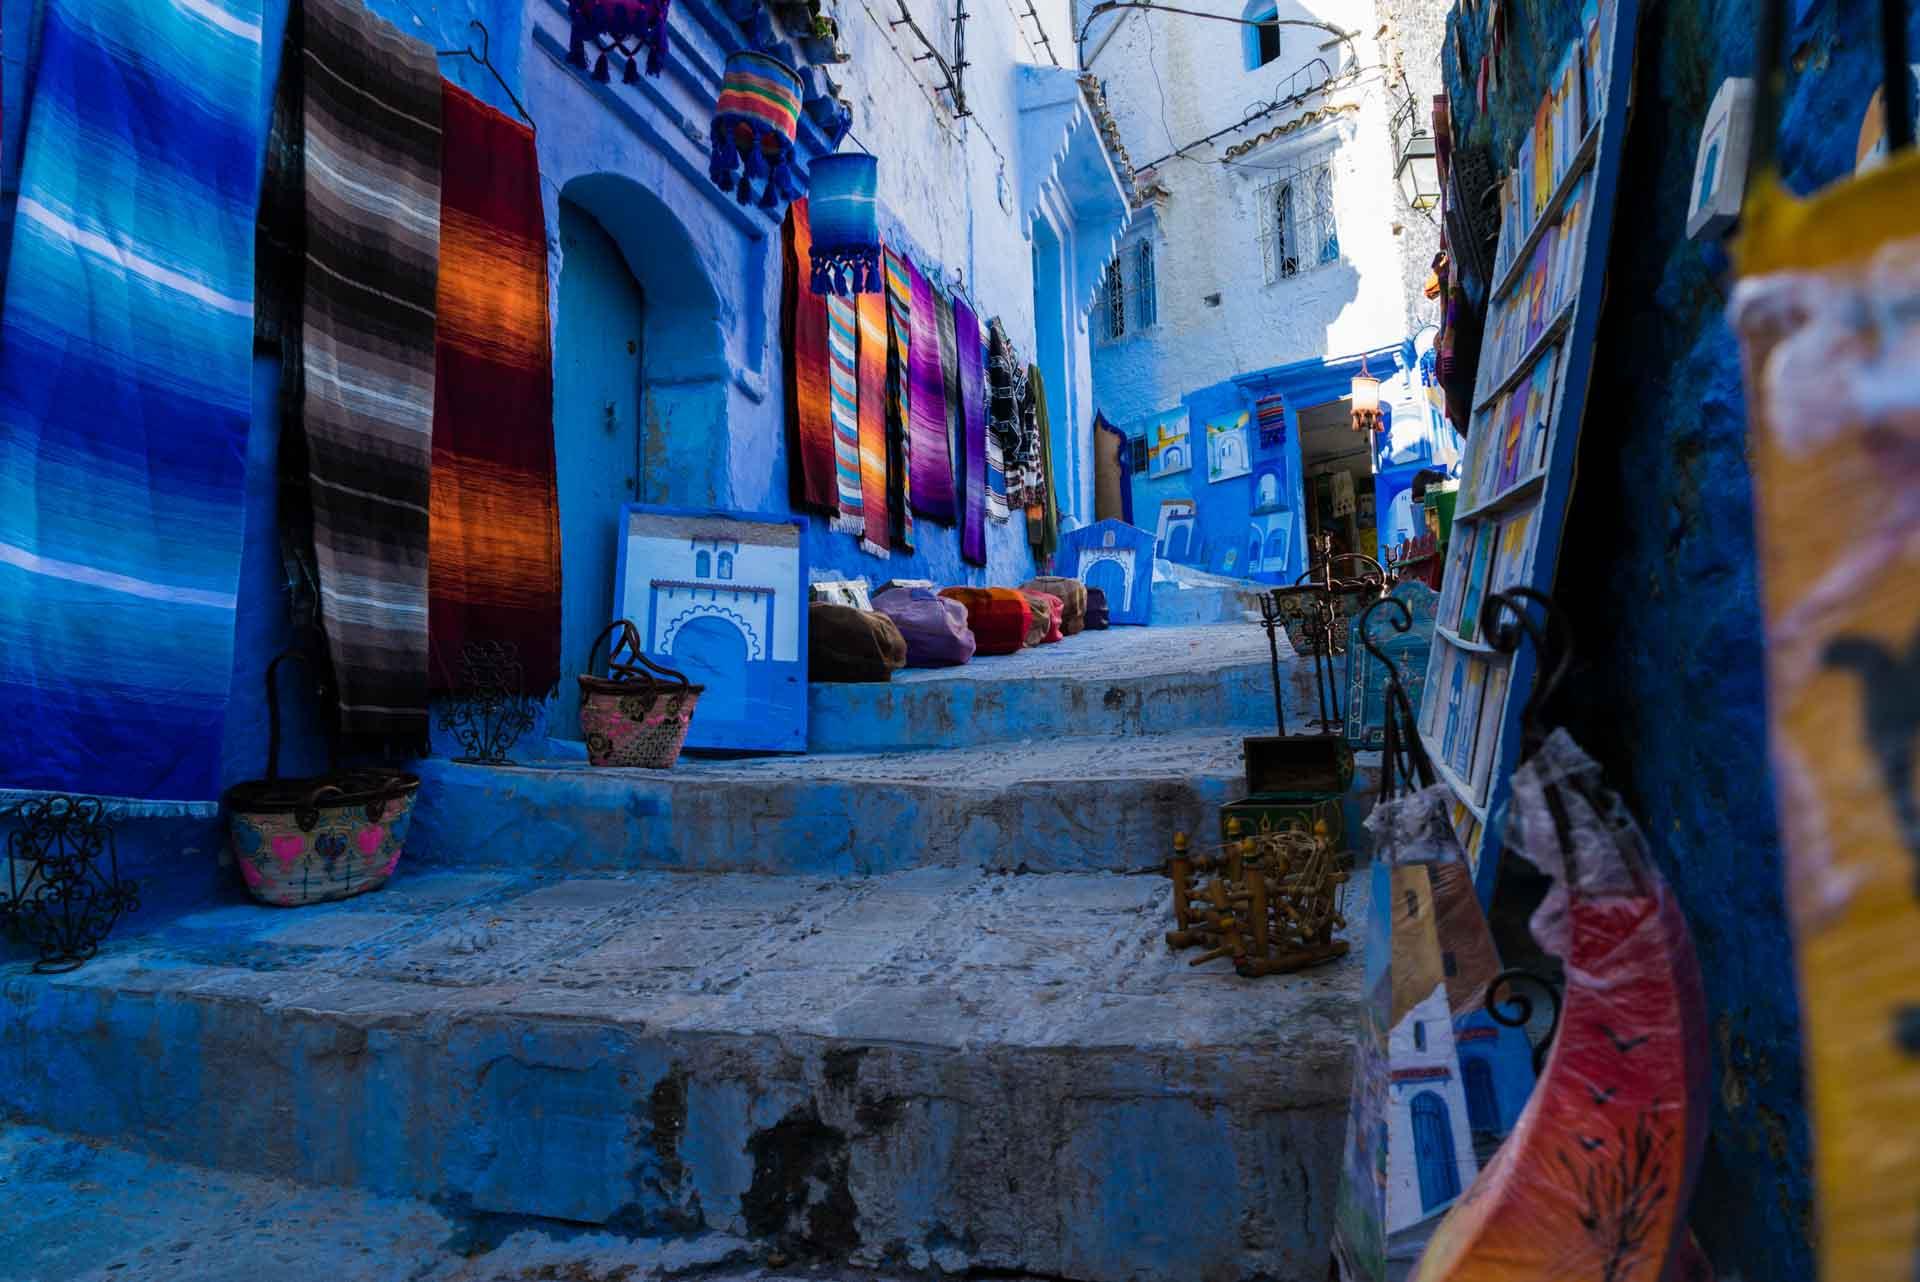 Morocco Chefchaouen blue shops